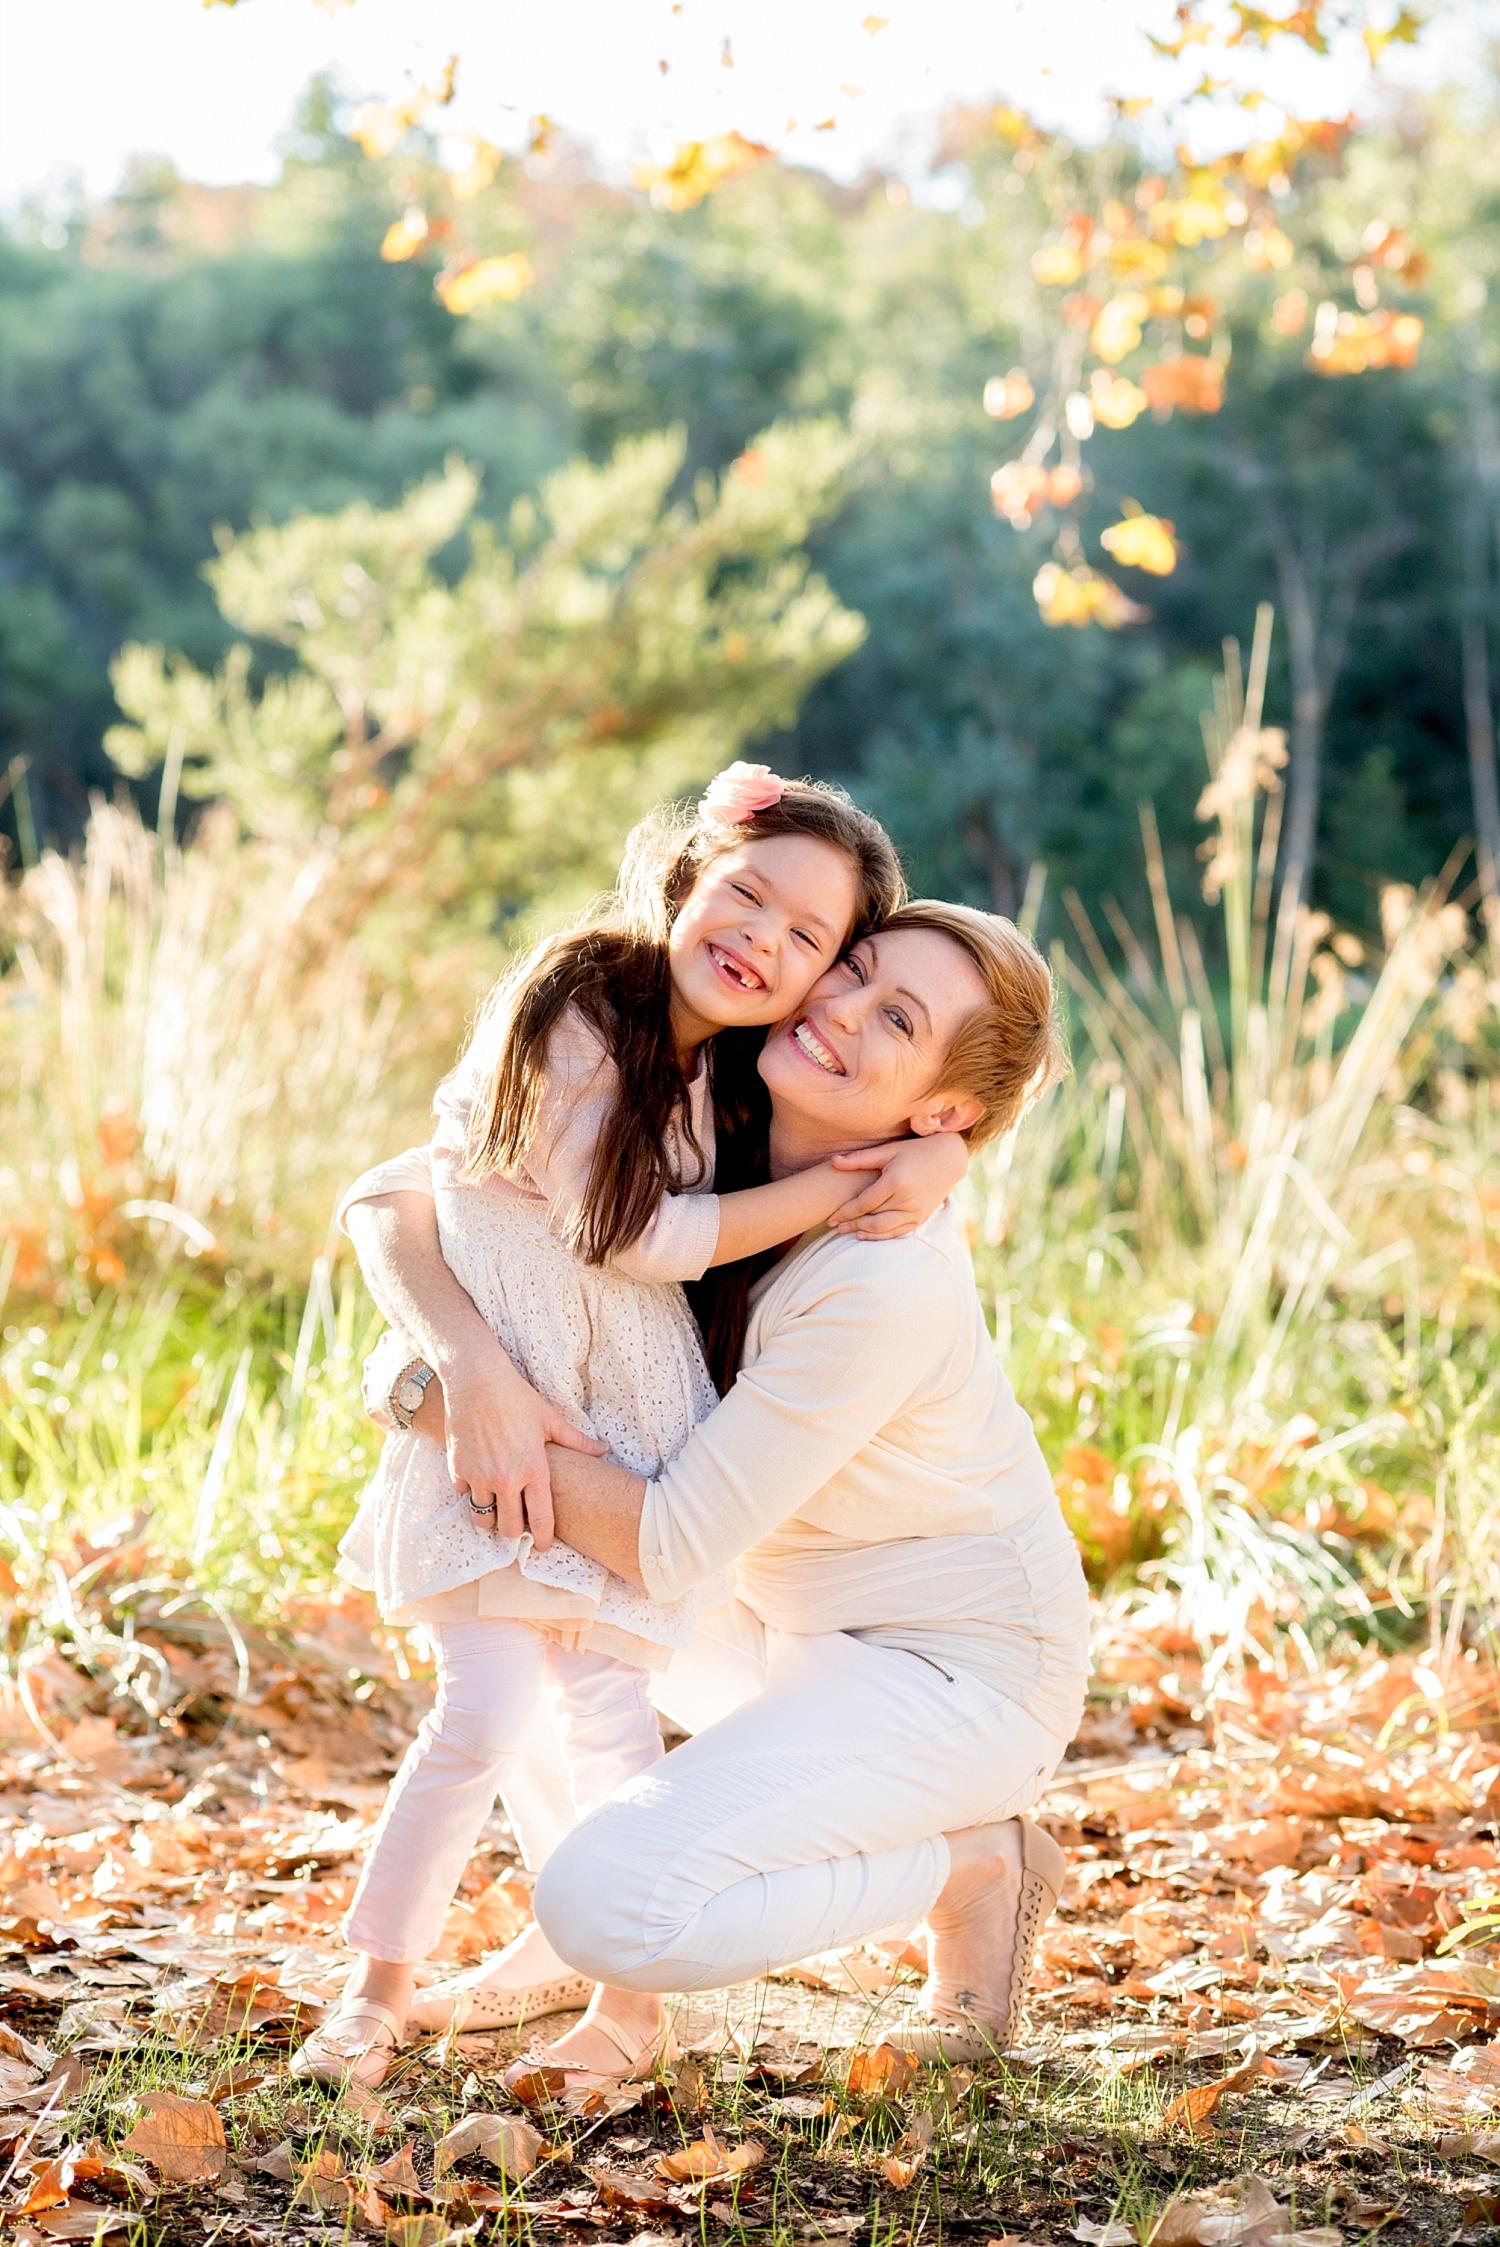 05_family portraits perth hyde park.jpg